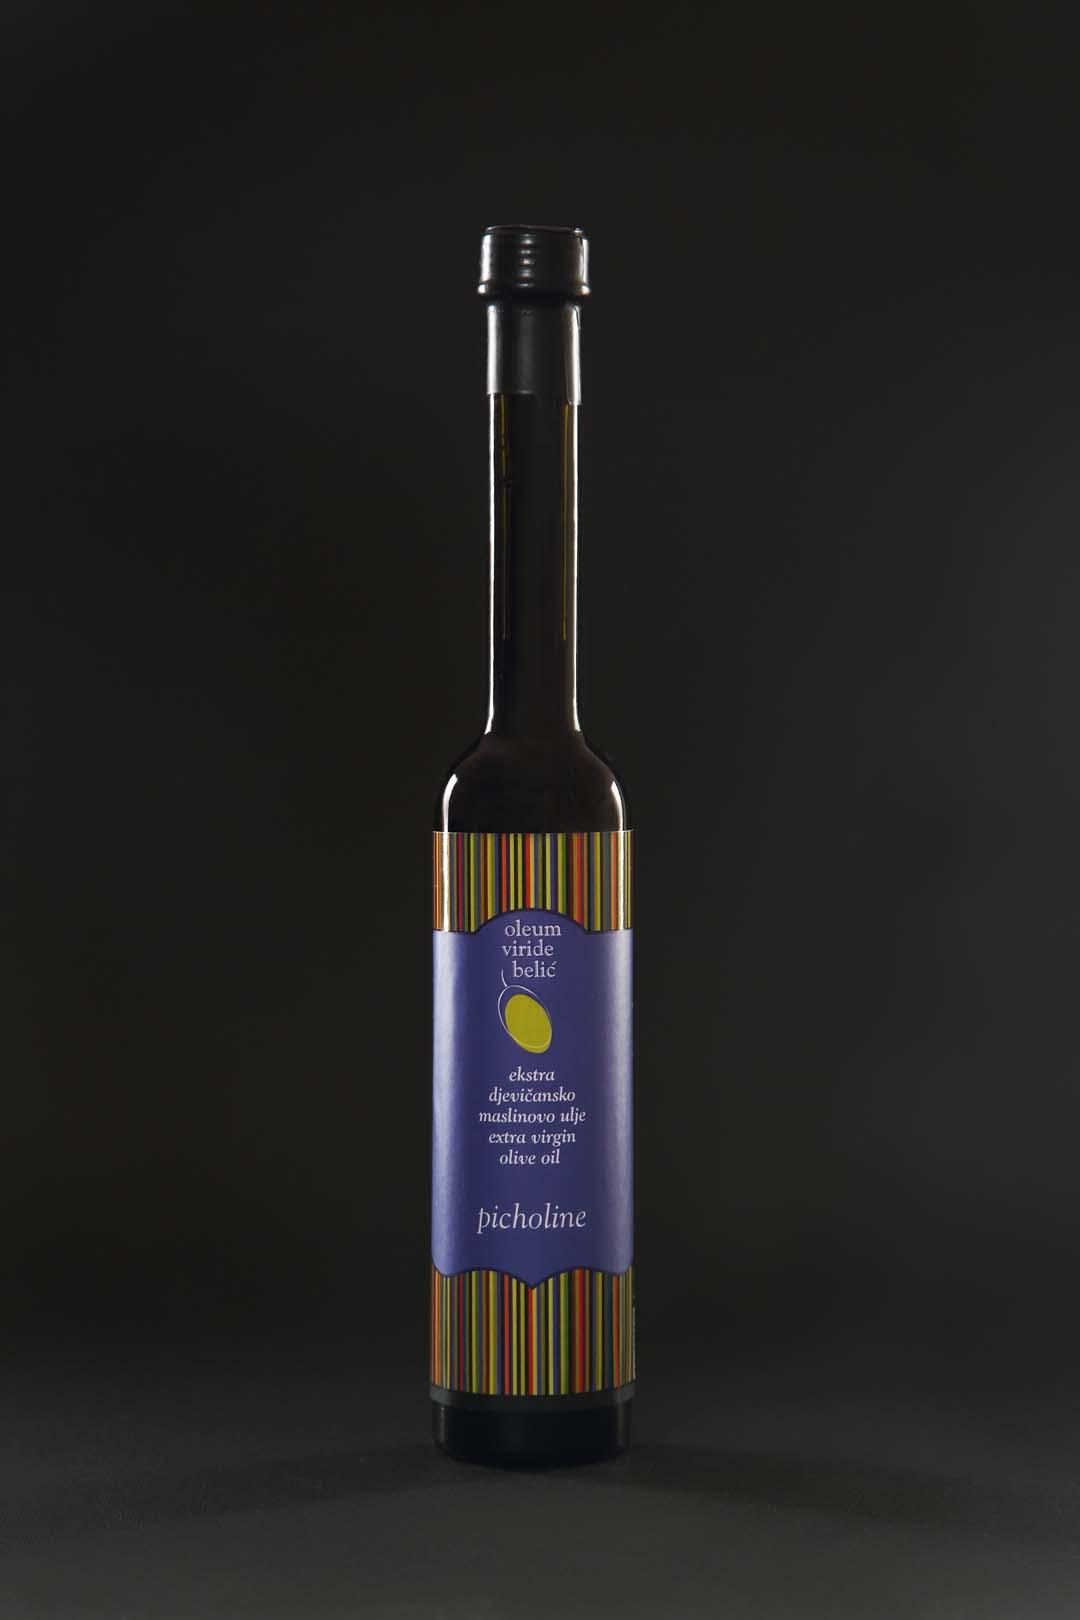 The Gift of Extra Virgin Olive Oil Oleum Viride Belić Istria Croatia finest istrian olive oil